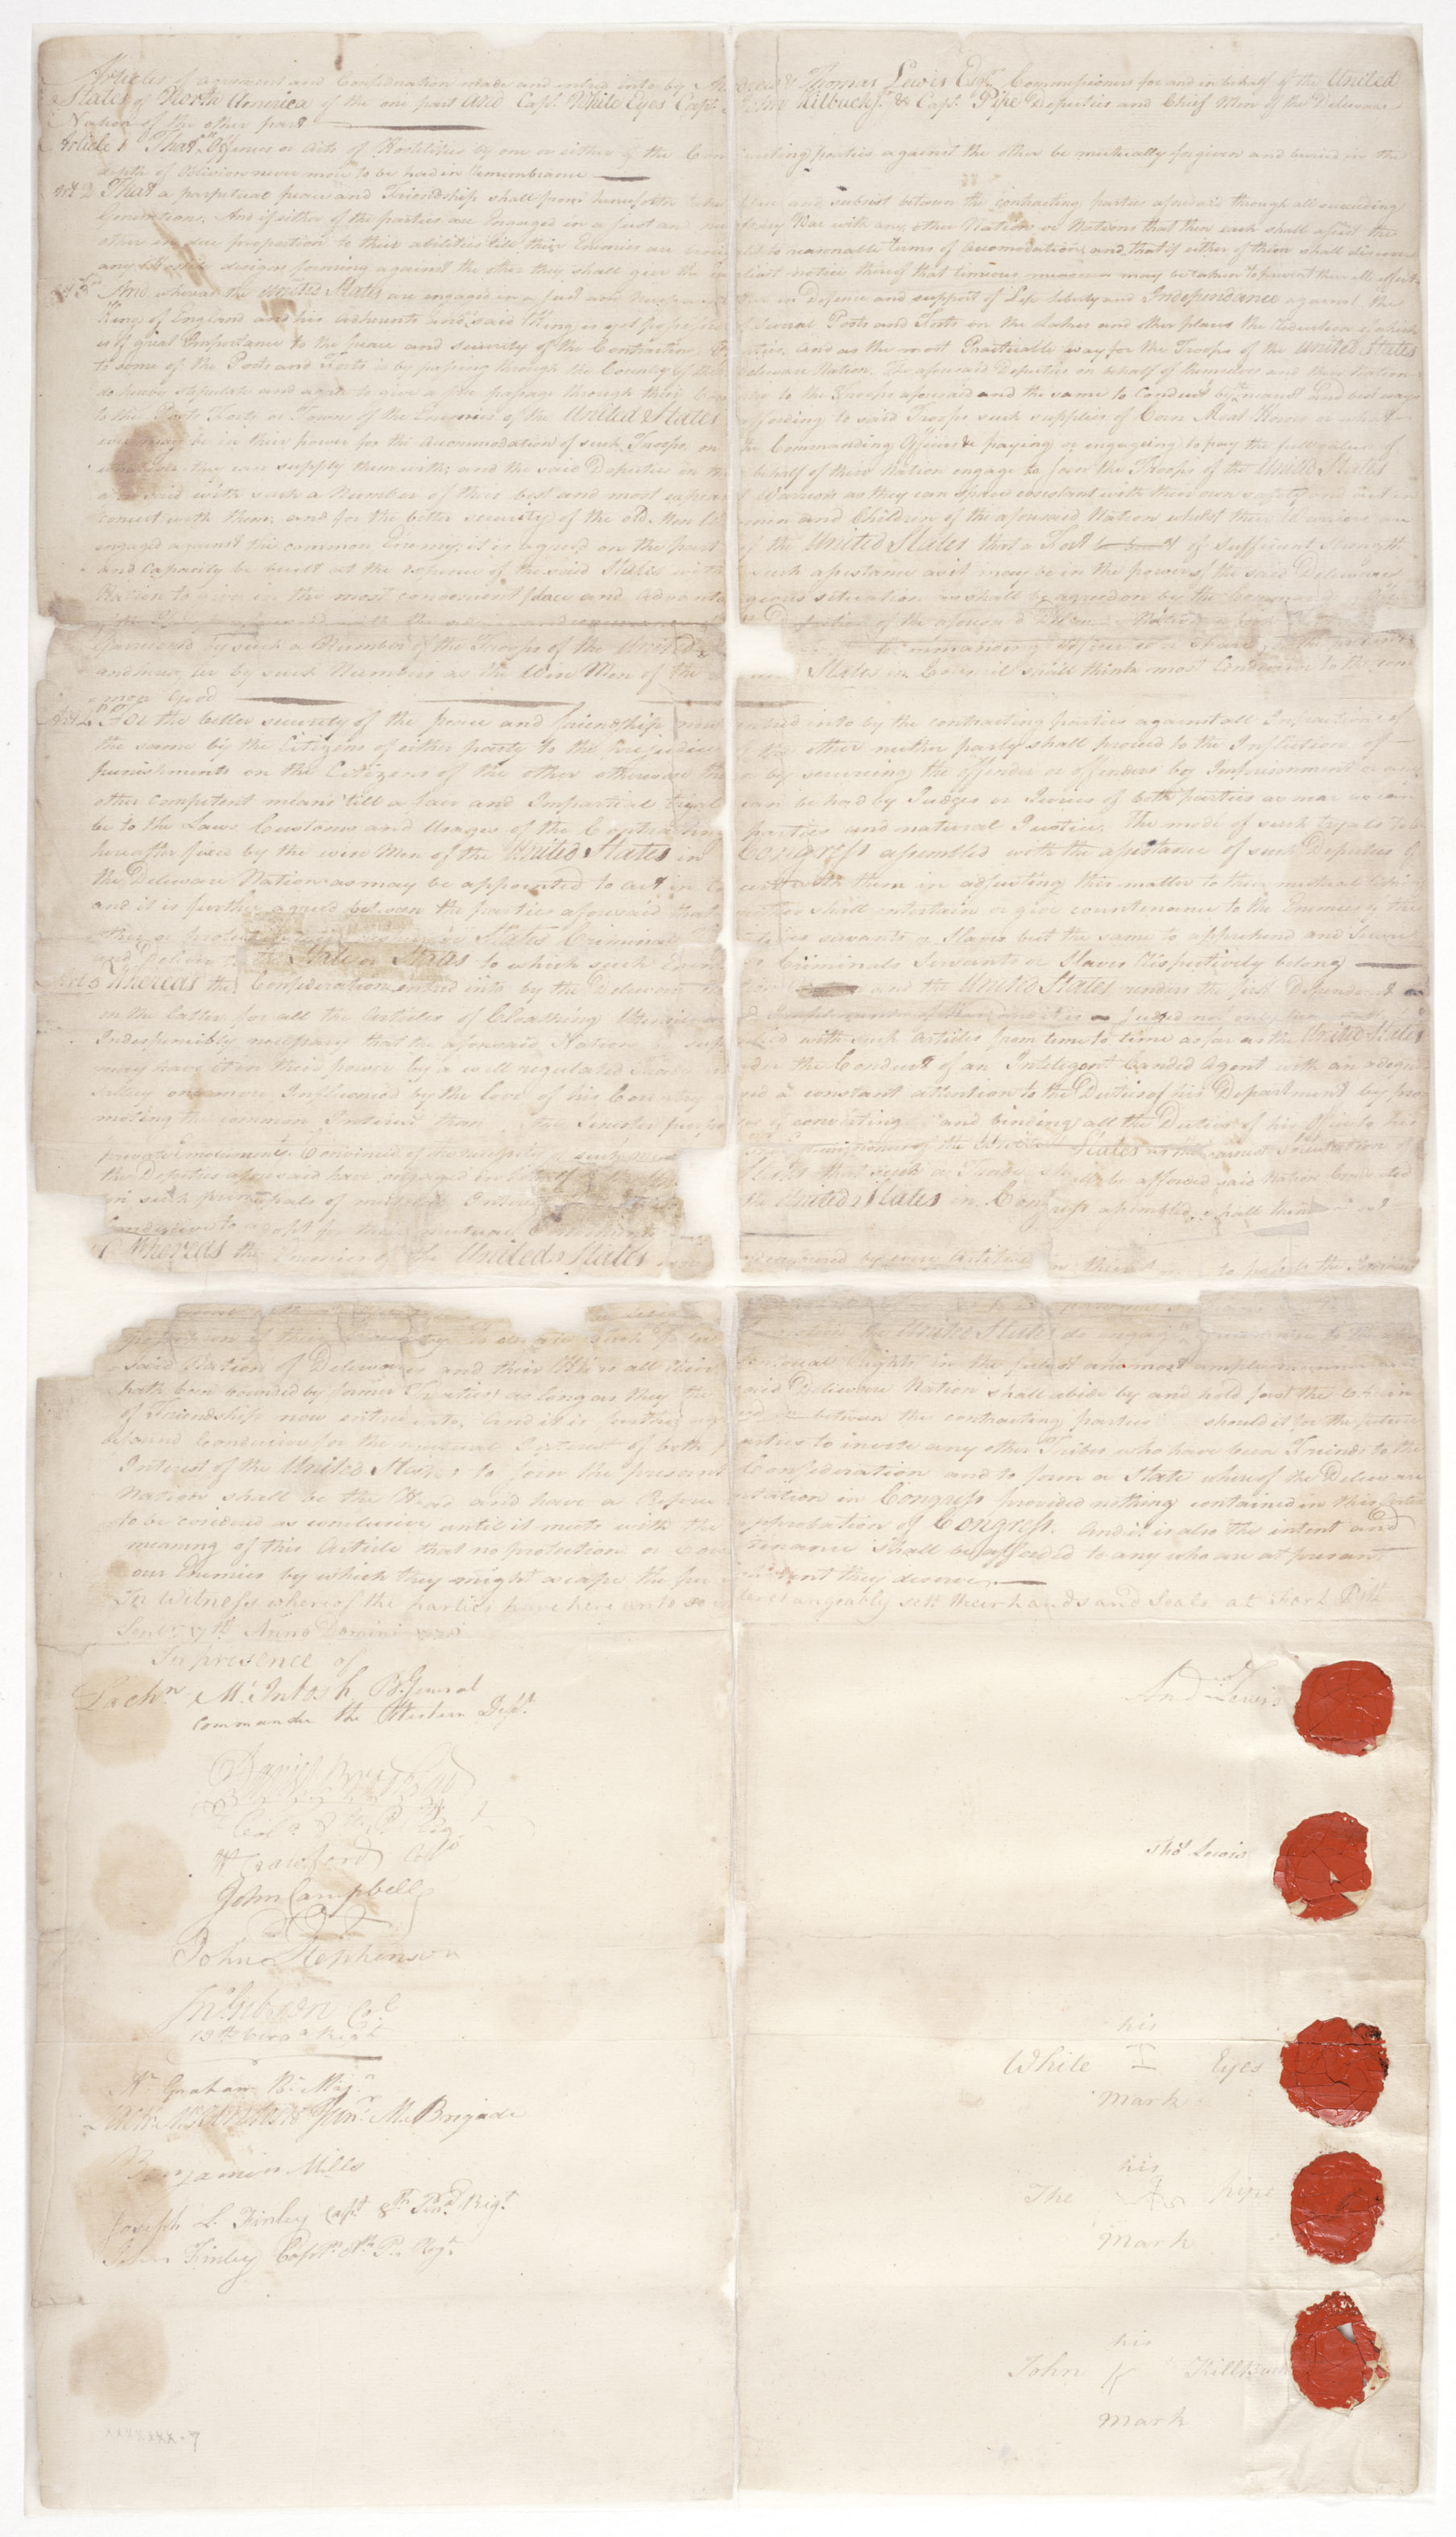 Handwritten treaty